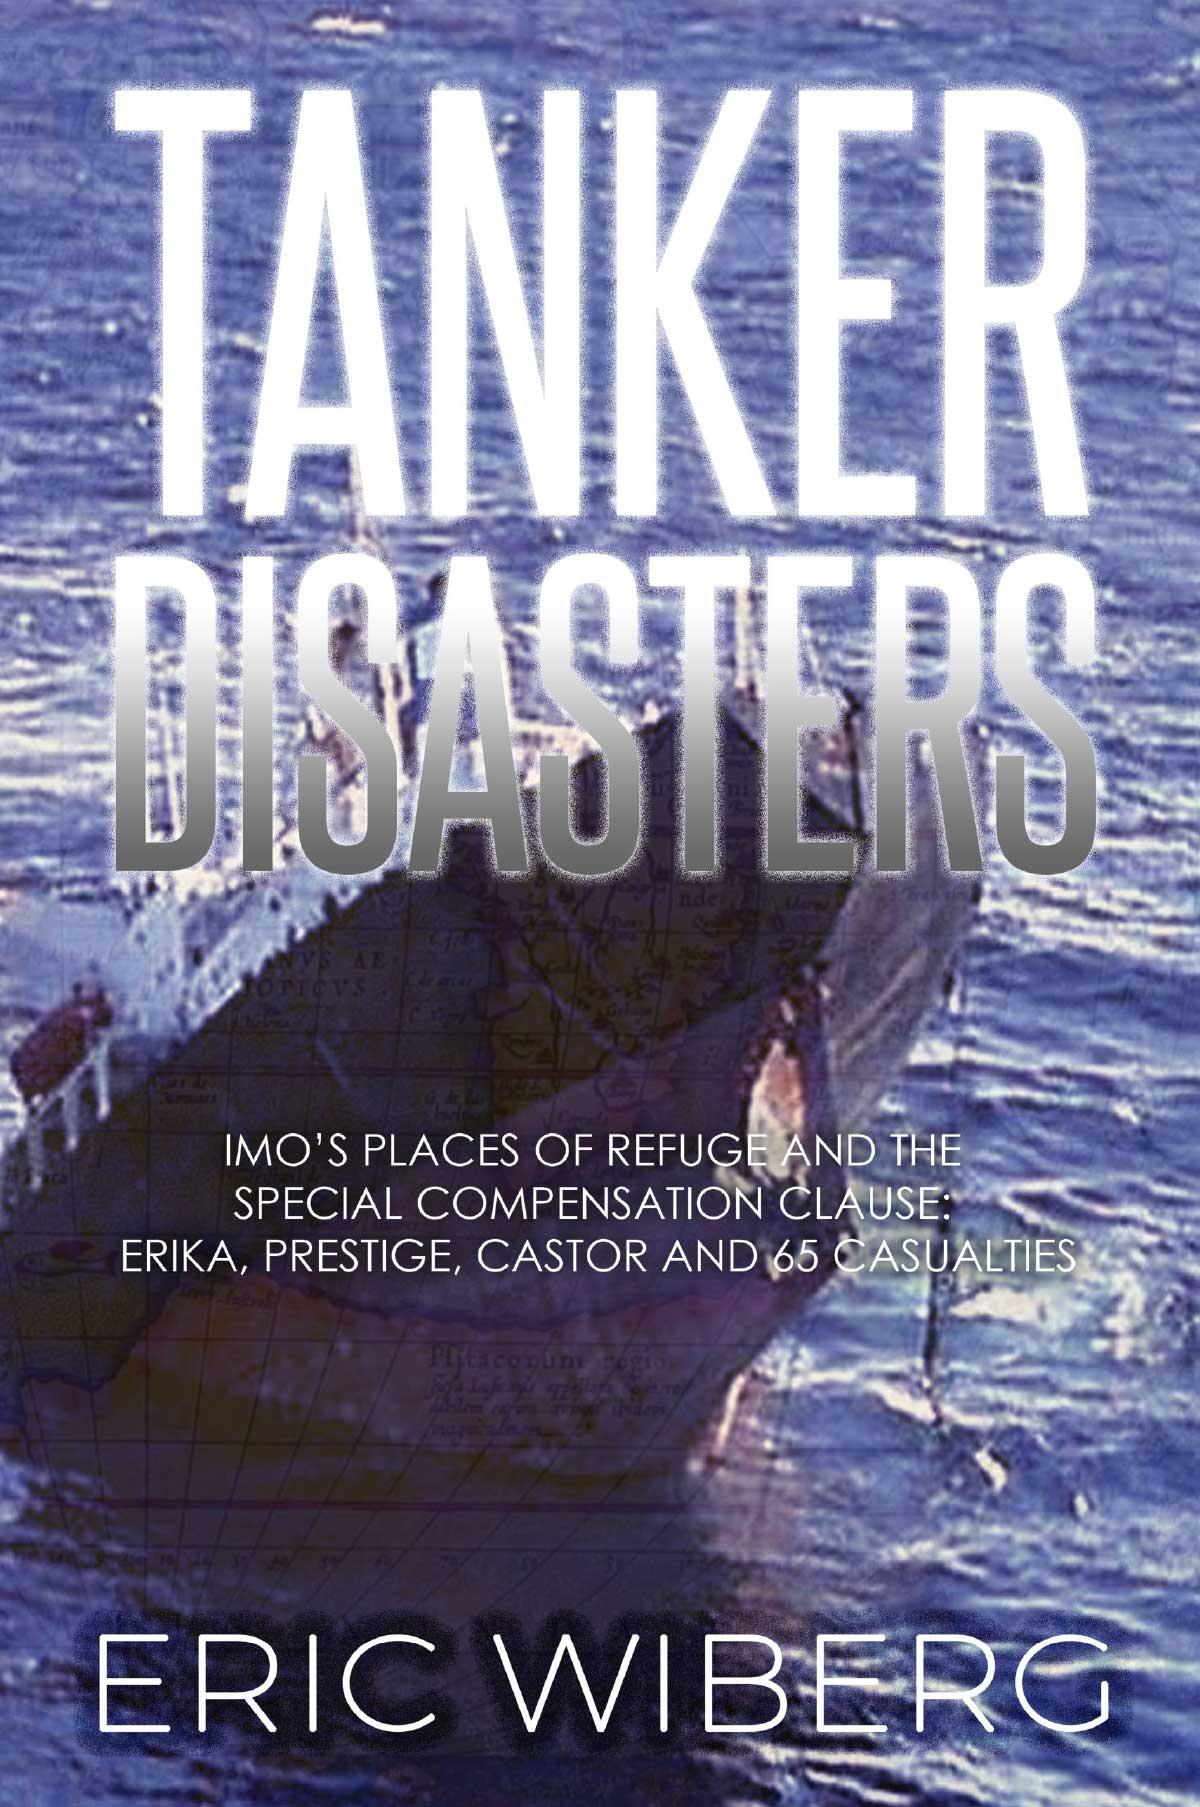 Tanker Disasters